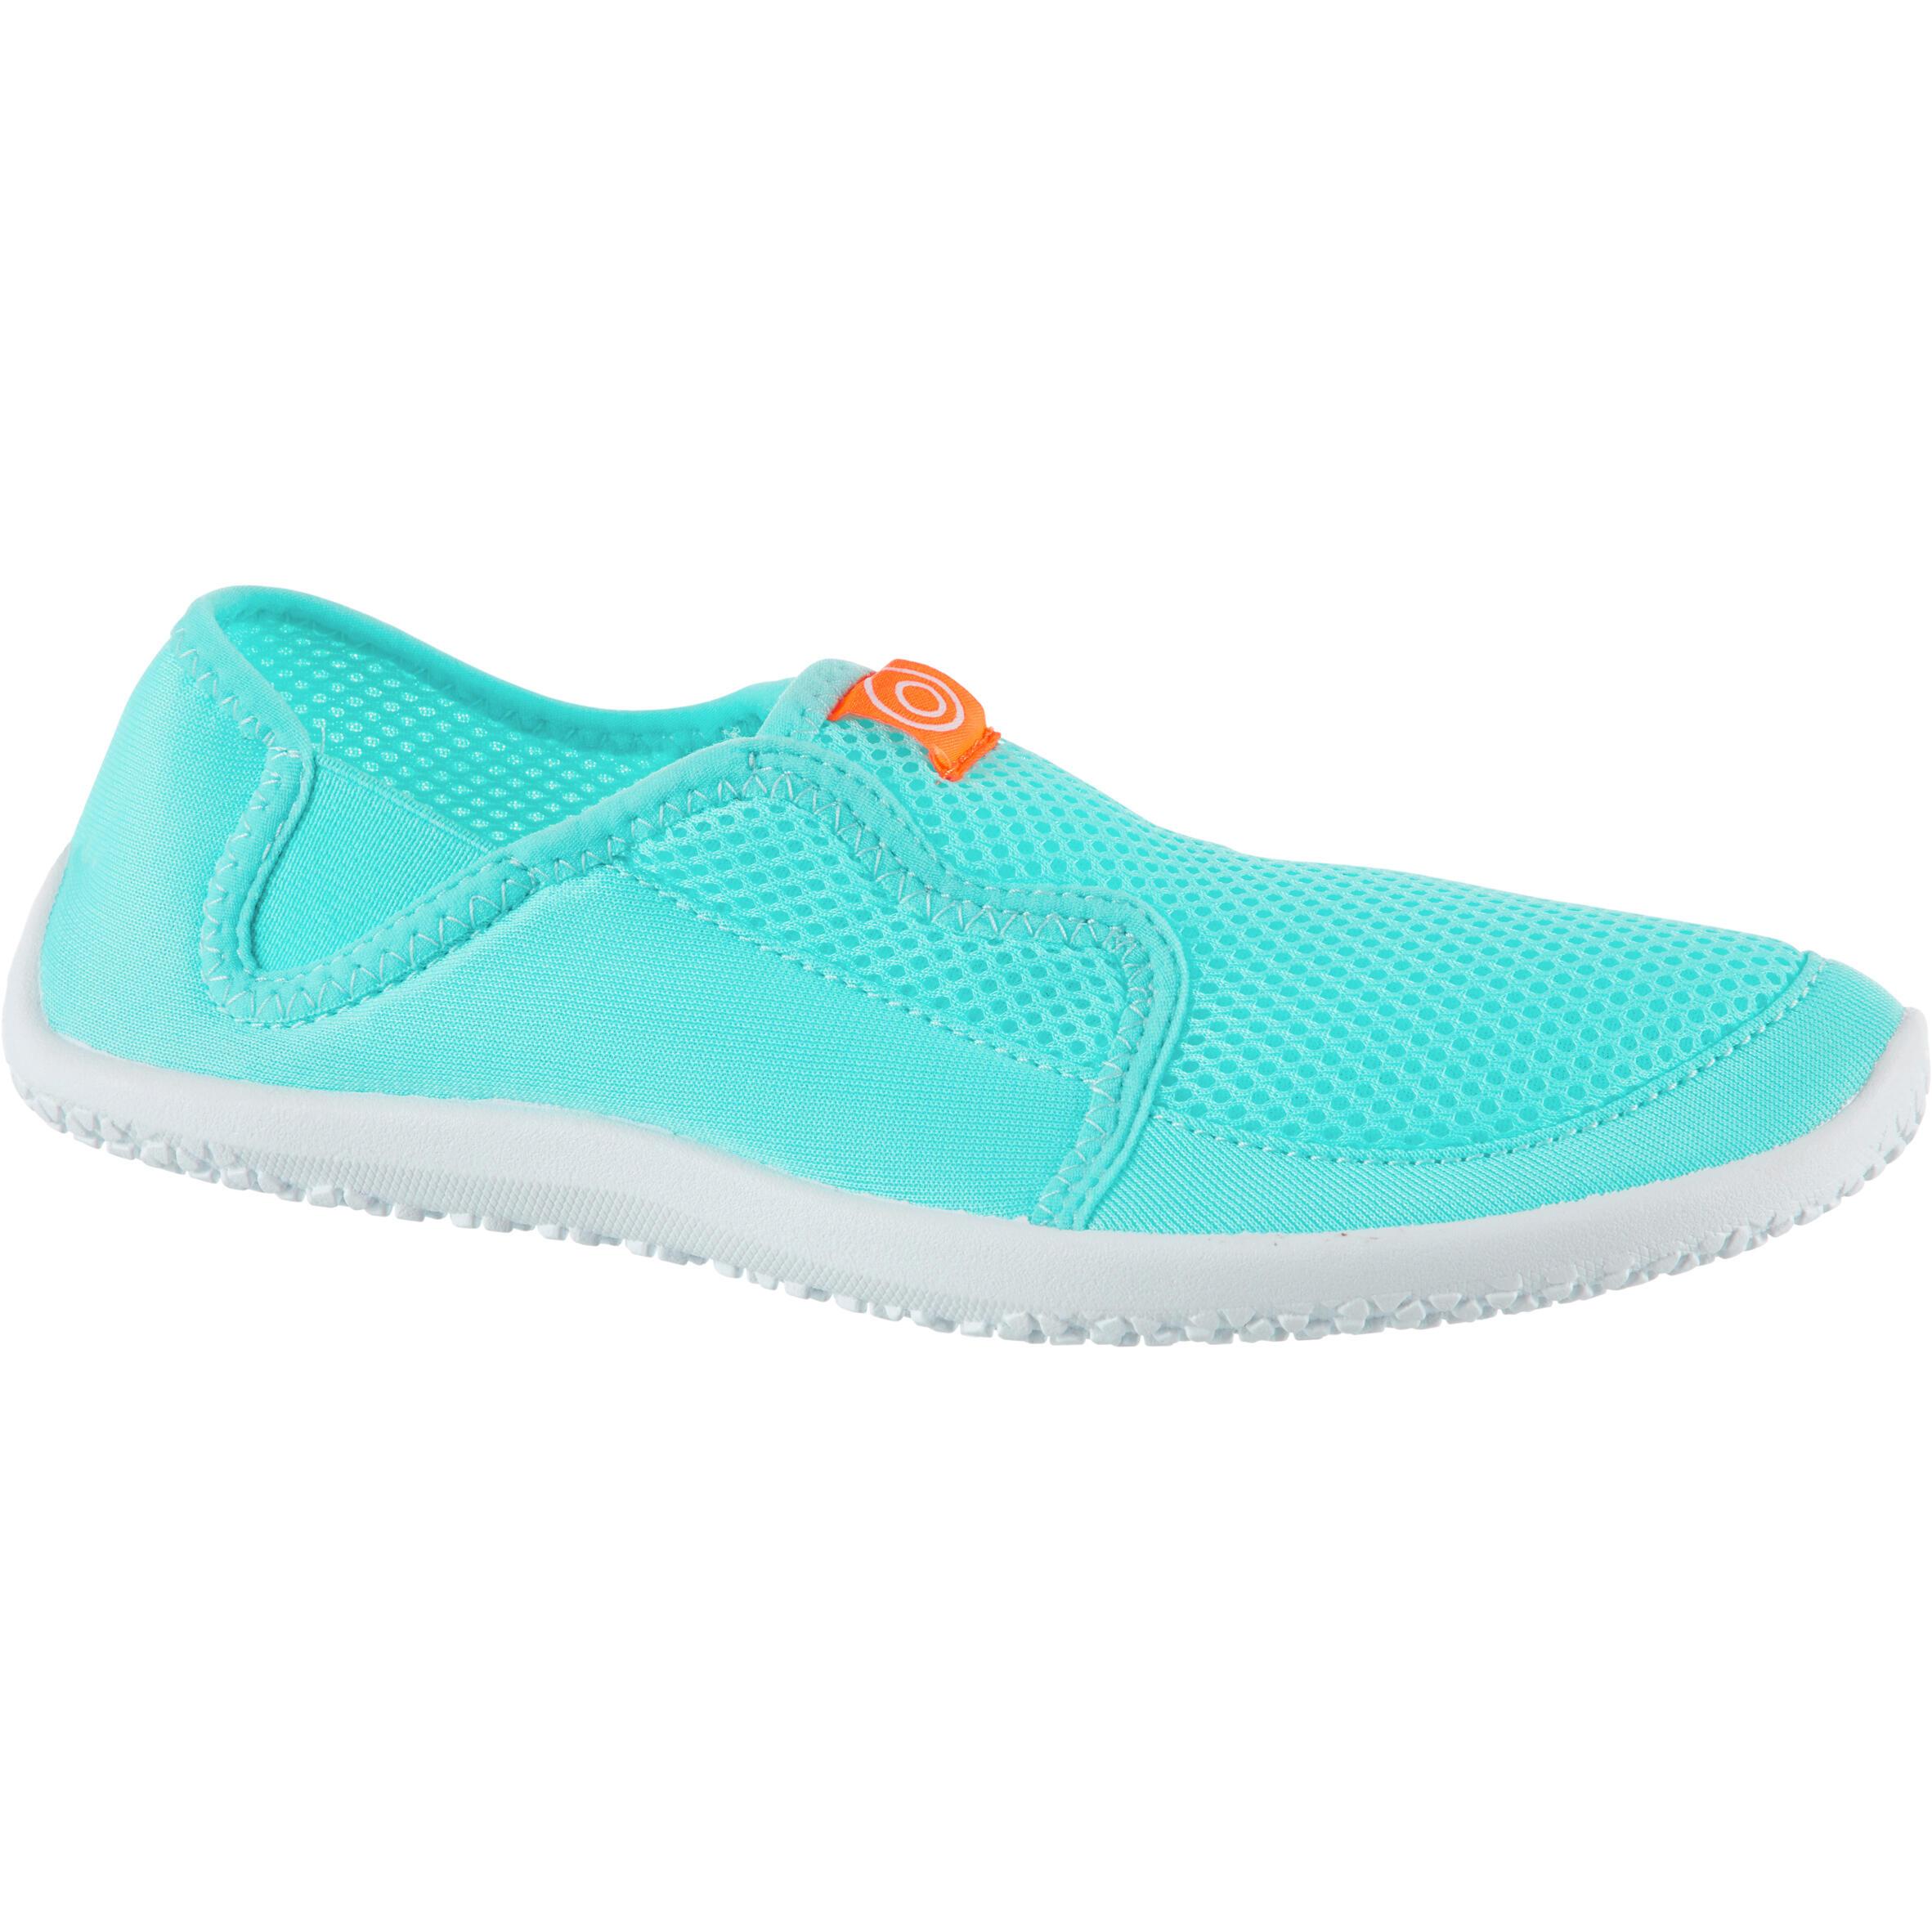 Aquaschuhe 120 Erwachsene | Schuhe > Badeschuhe | Subea